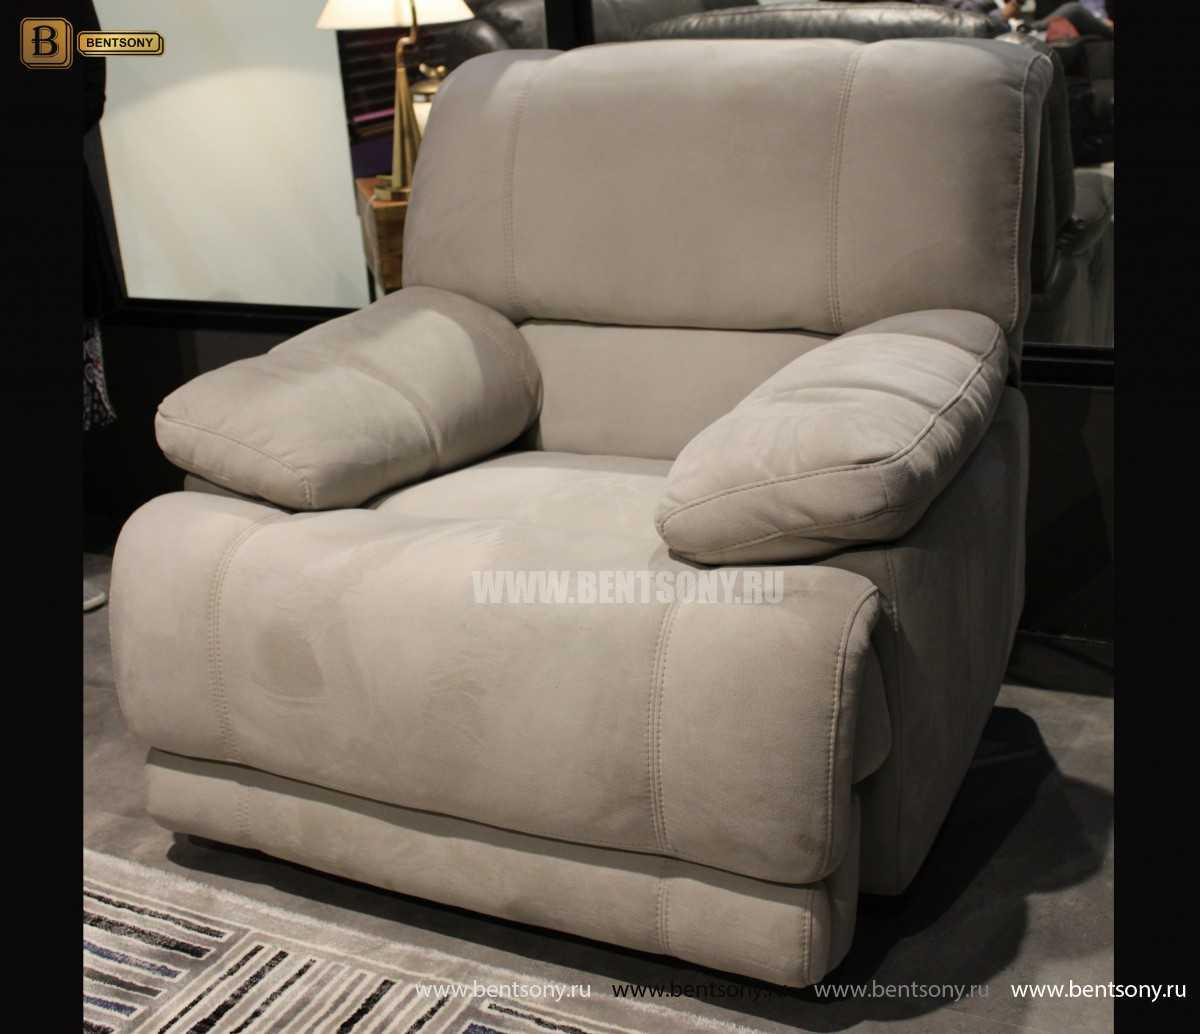 Кресло Марко (Реклайнер, Алькантара) каталог